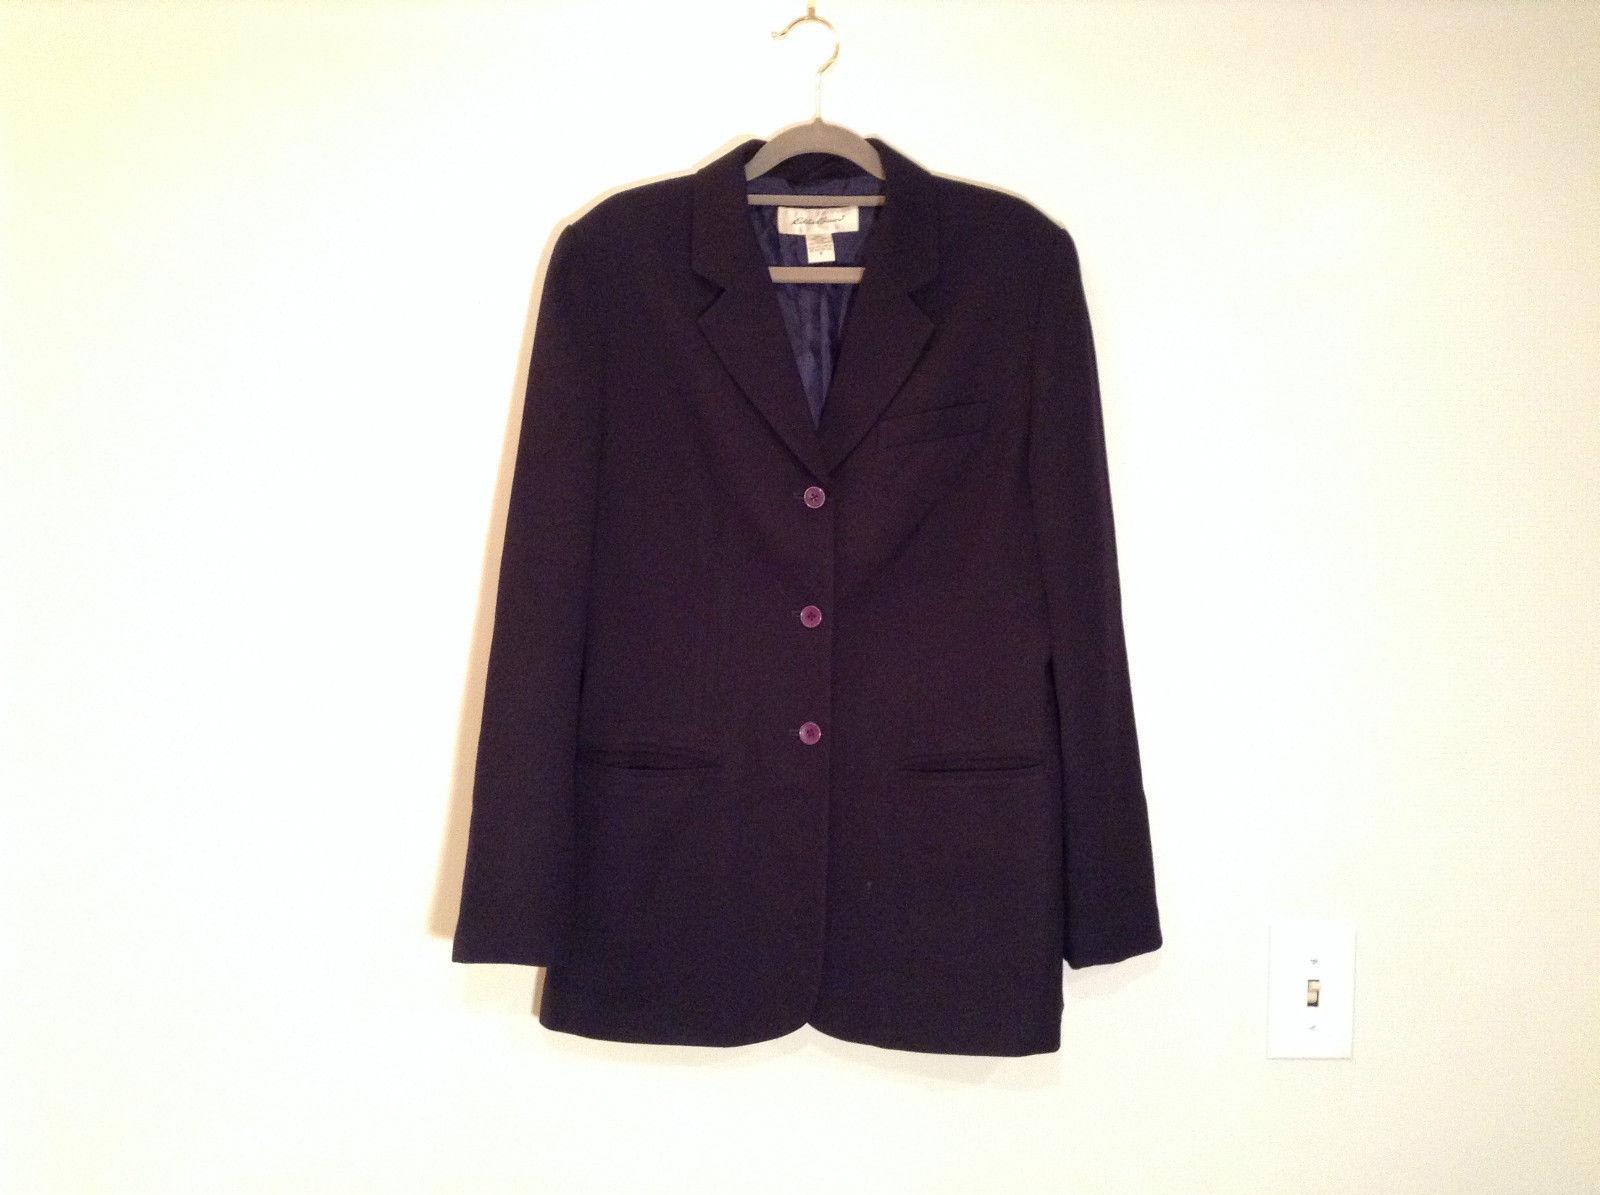 Black Fully Lined Eddie Bauer 100 Percent Wool Blazer Jacket Size 8